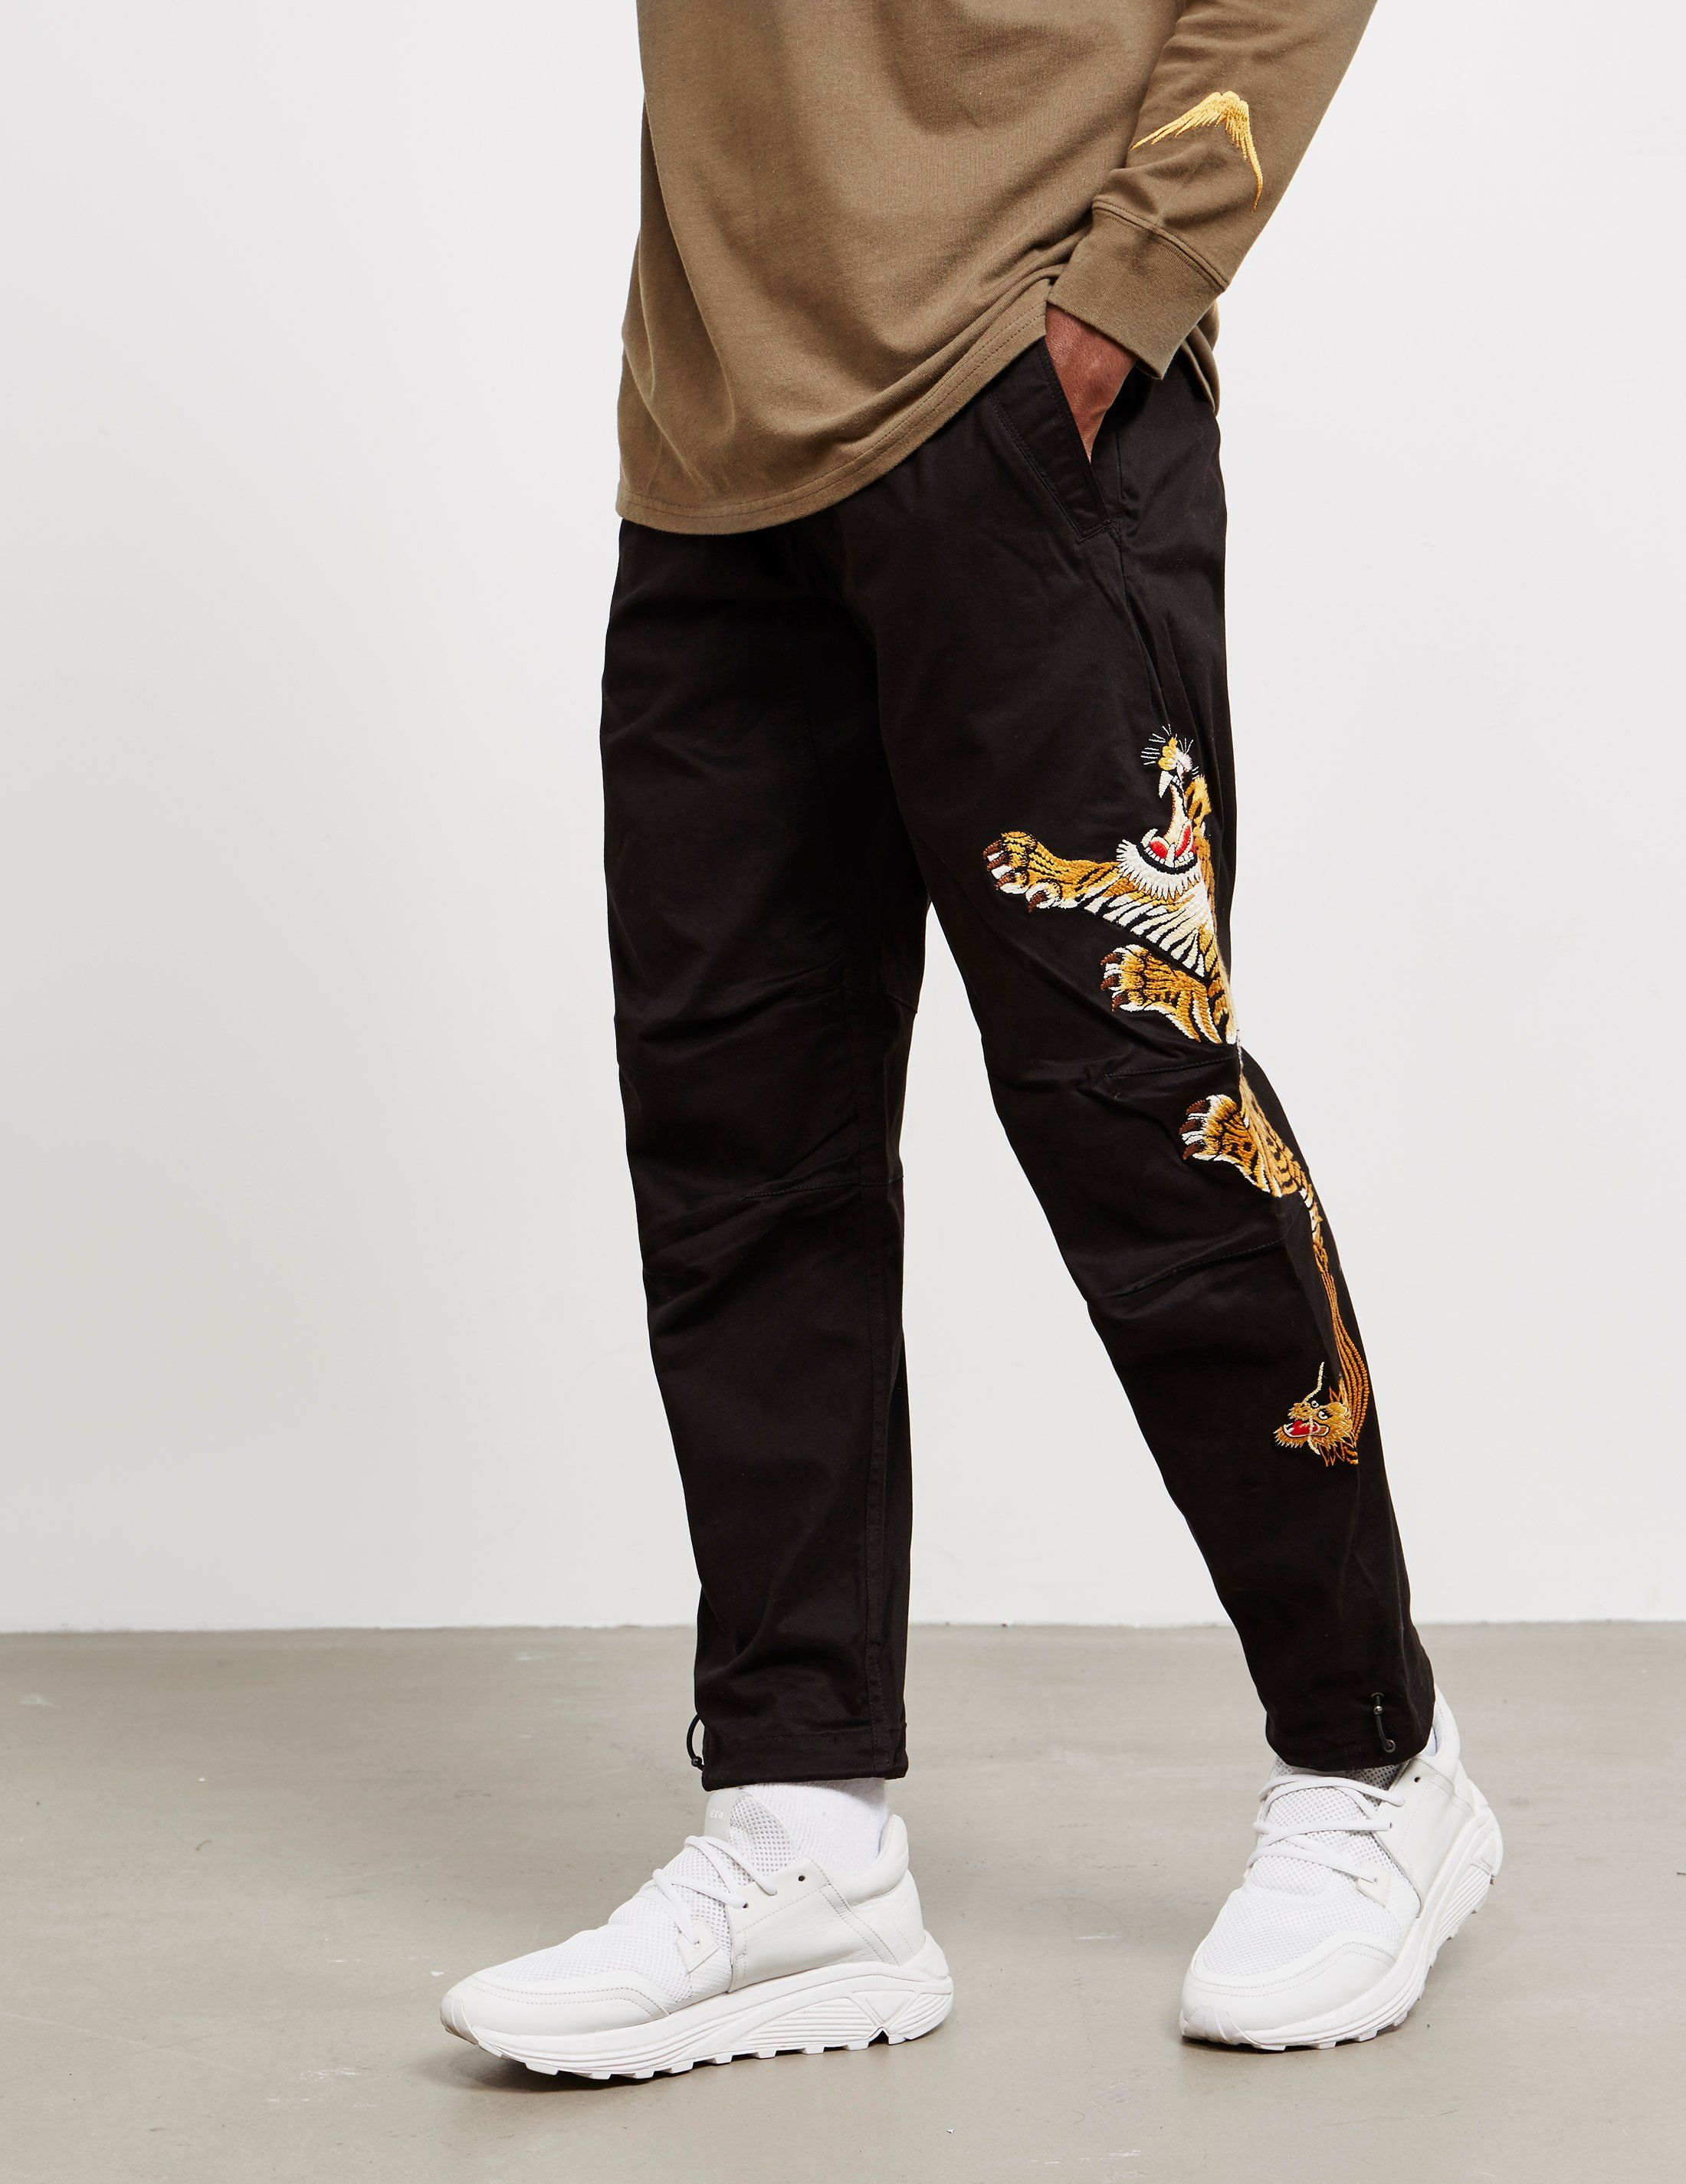 Maharishi Tiger Woven Track Pants - Online Exclusive